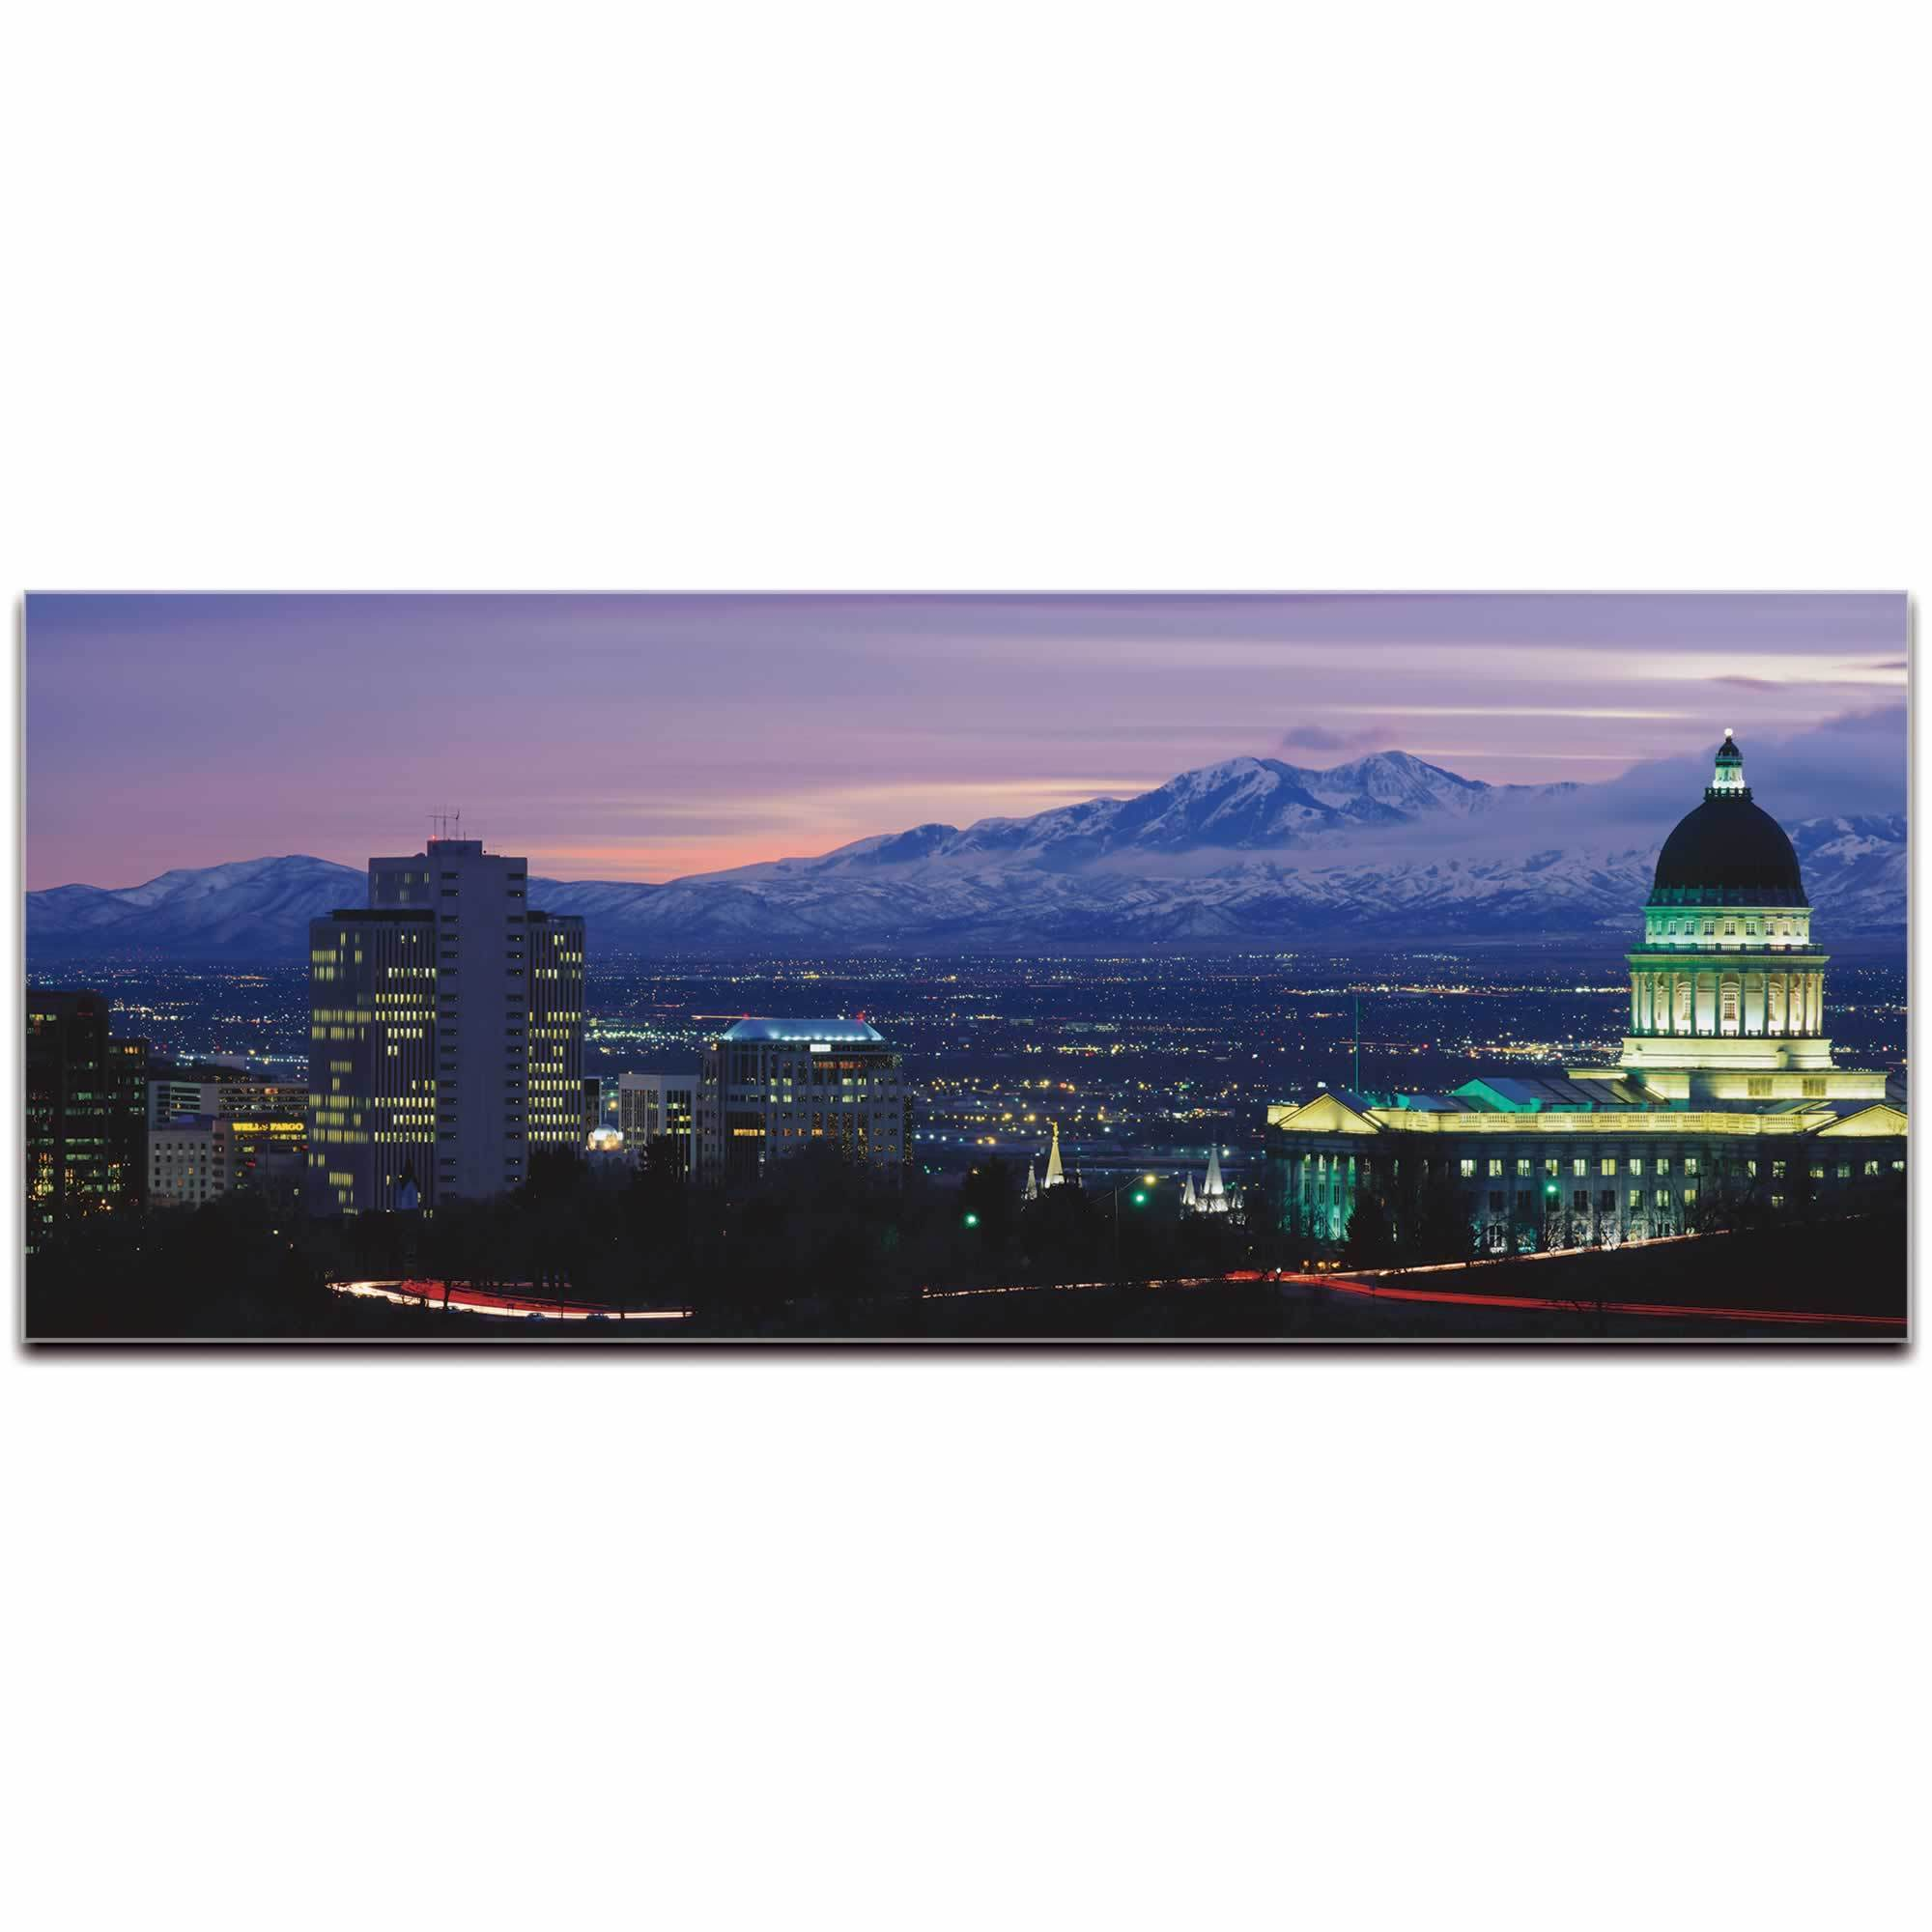 Modern Crowd 'Salt Lake City City Skyline' Urban Cityscap...